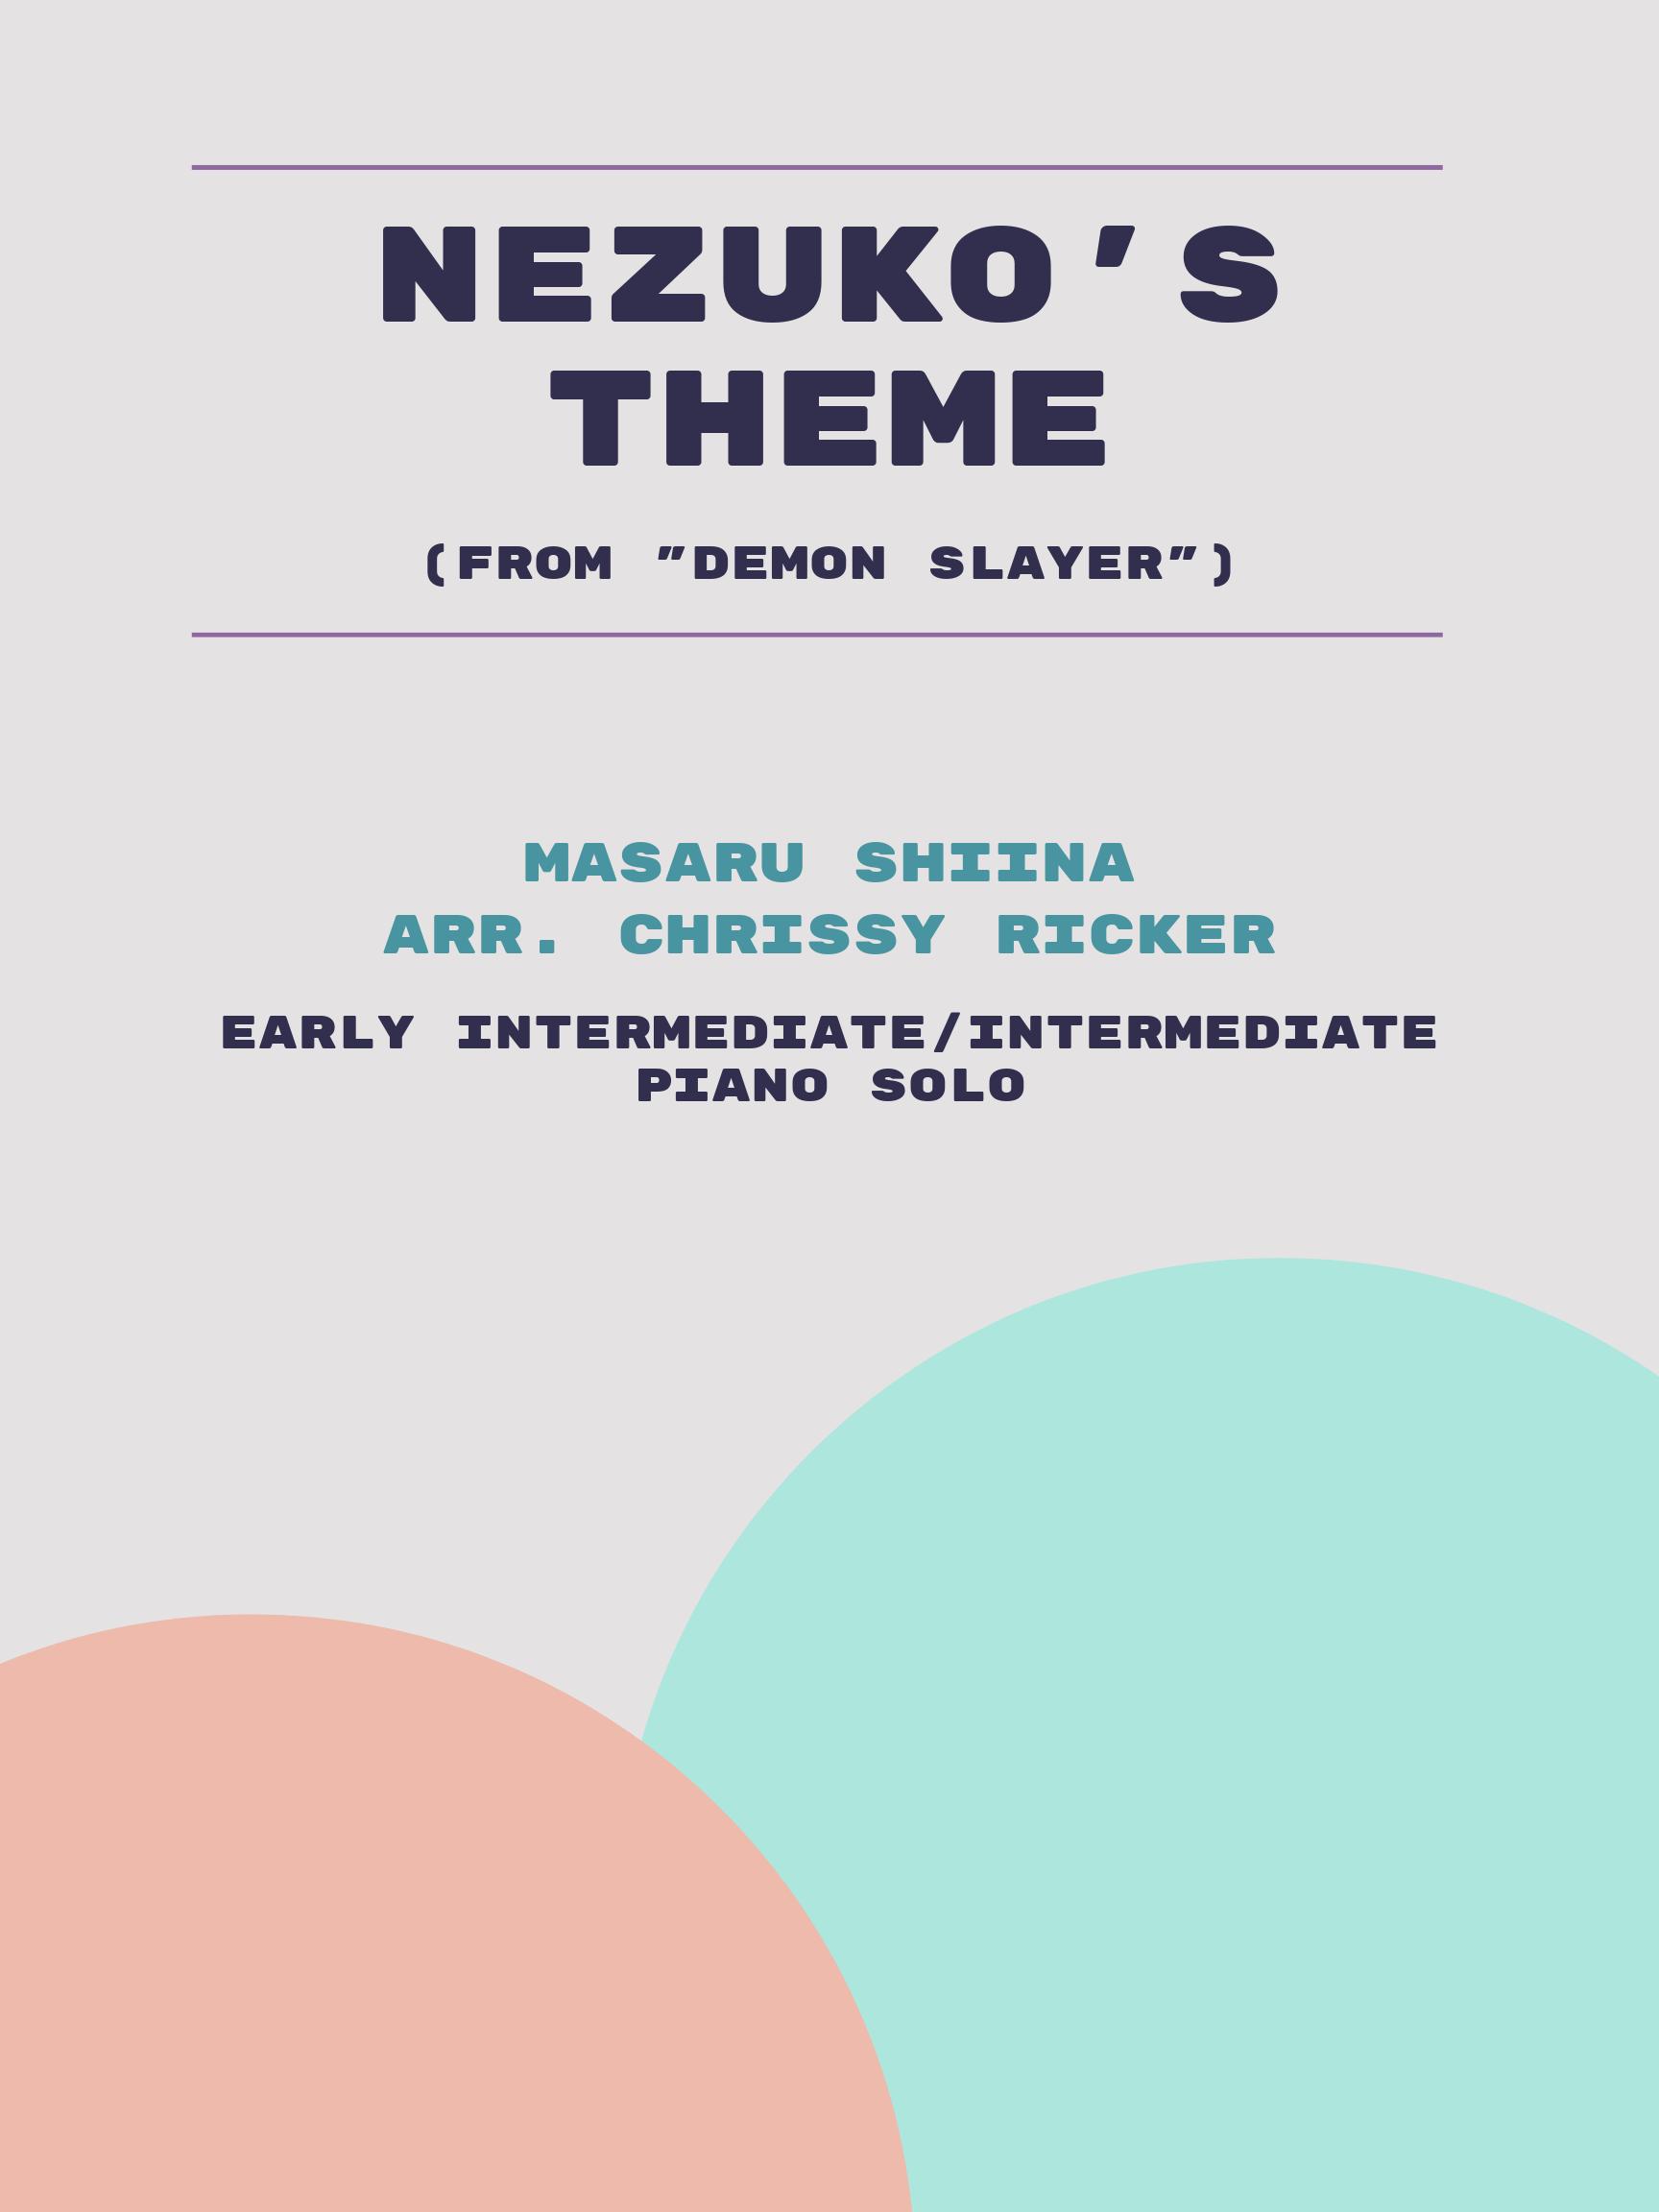 Nezuko's Theme by Masaru Shiina